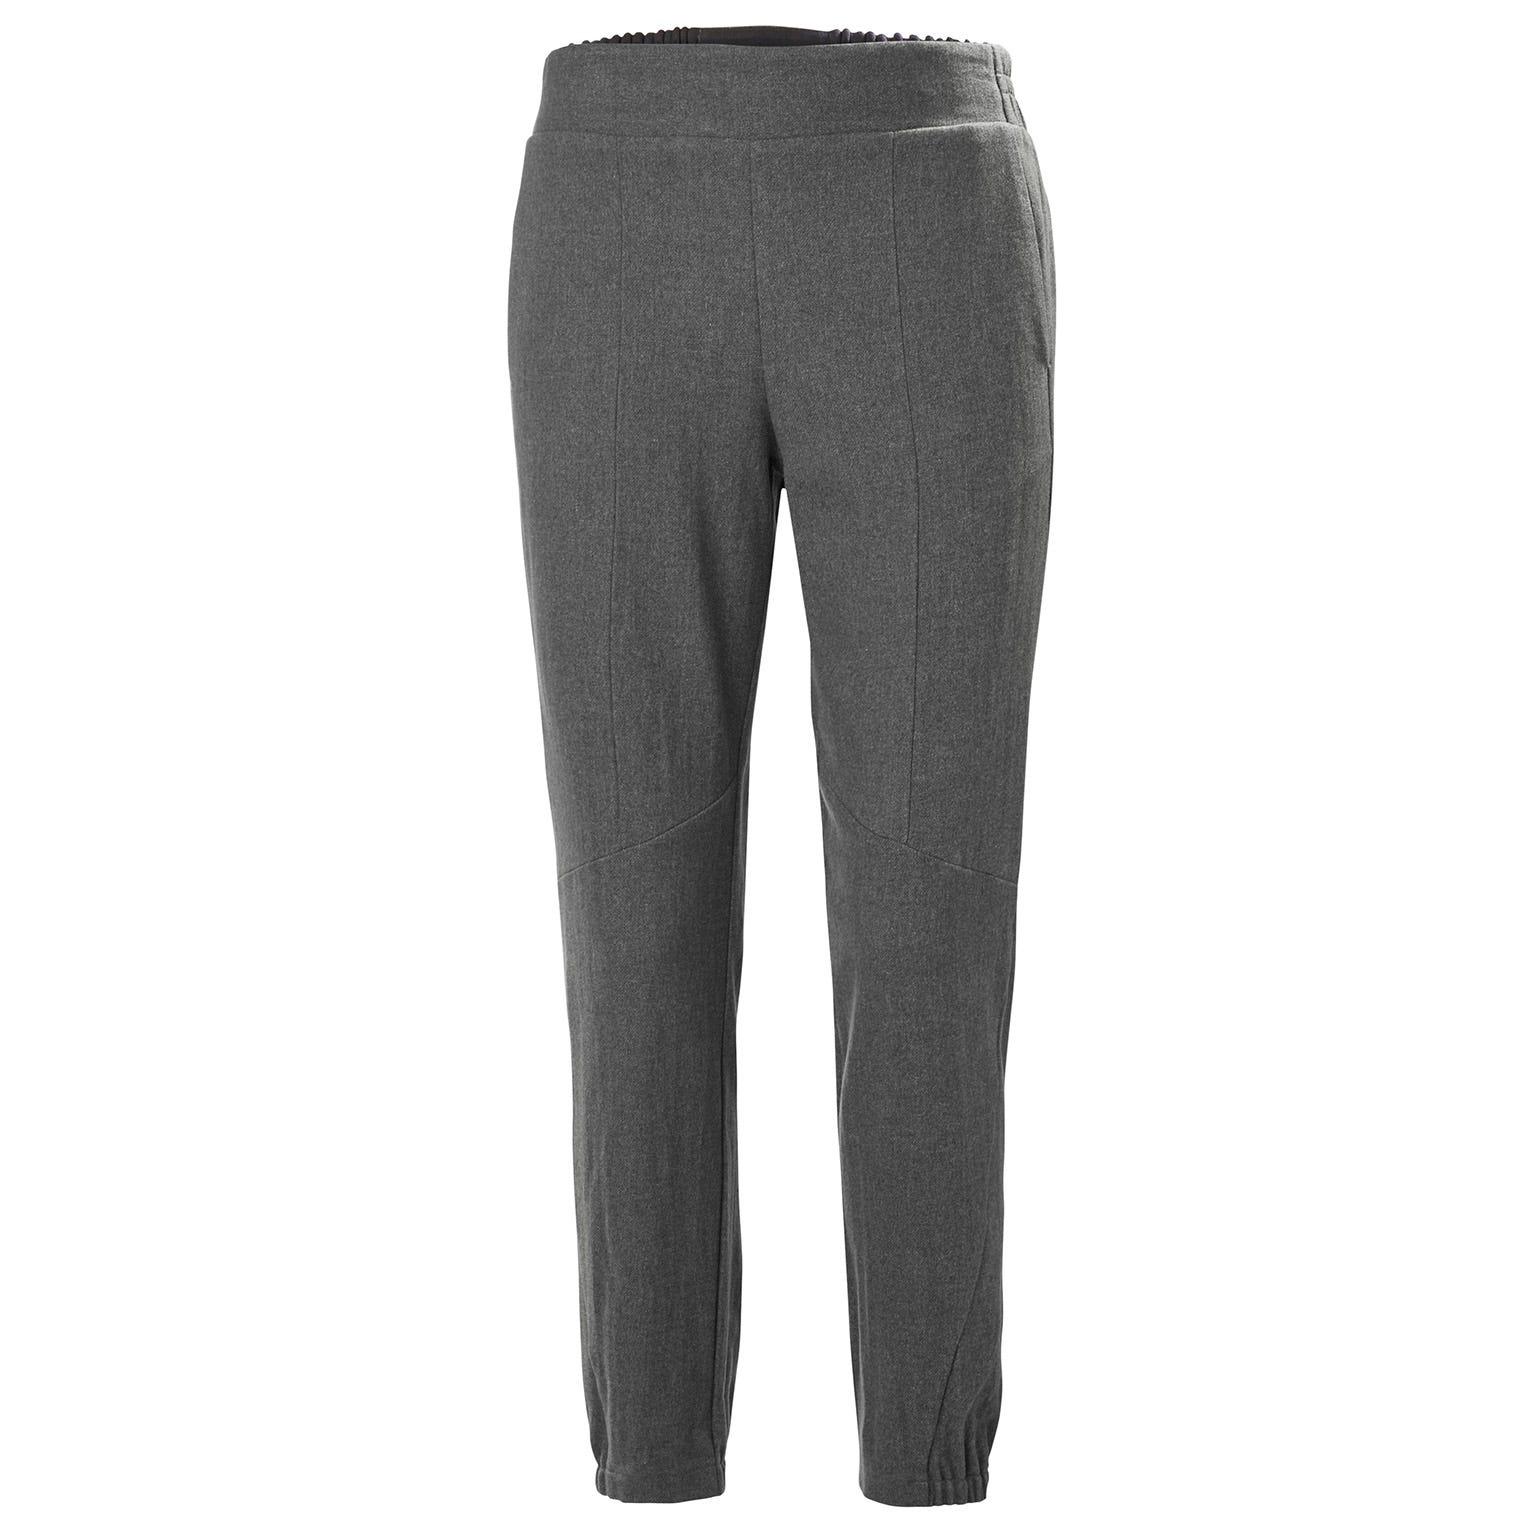 Helly Hansen W Wool Travel Pant Womens Hiking Grey XS